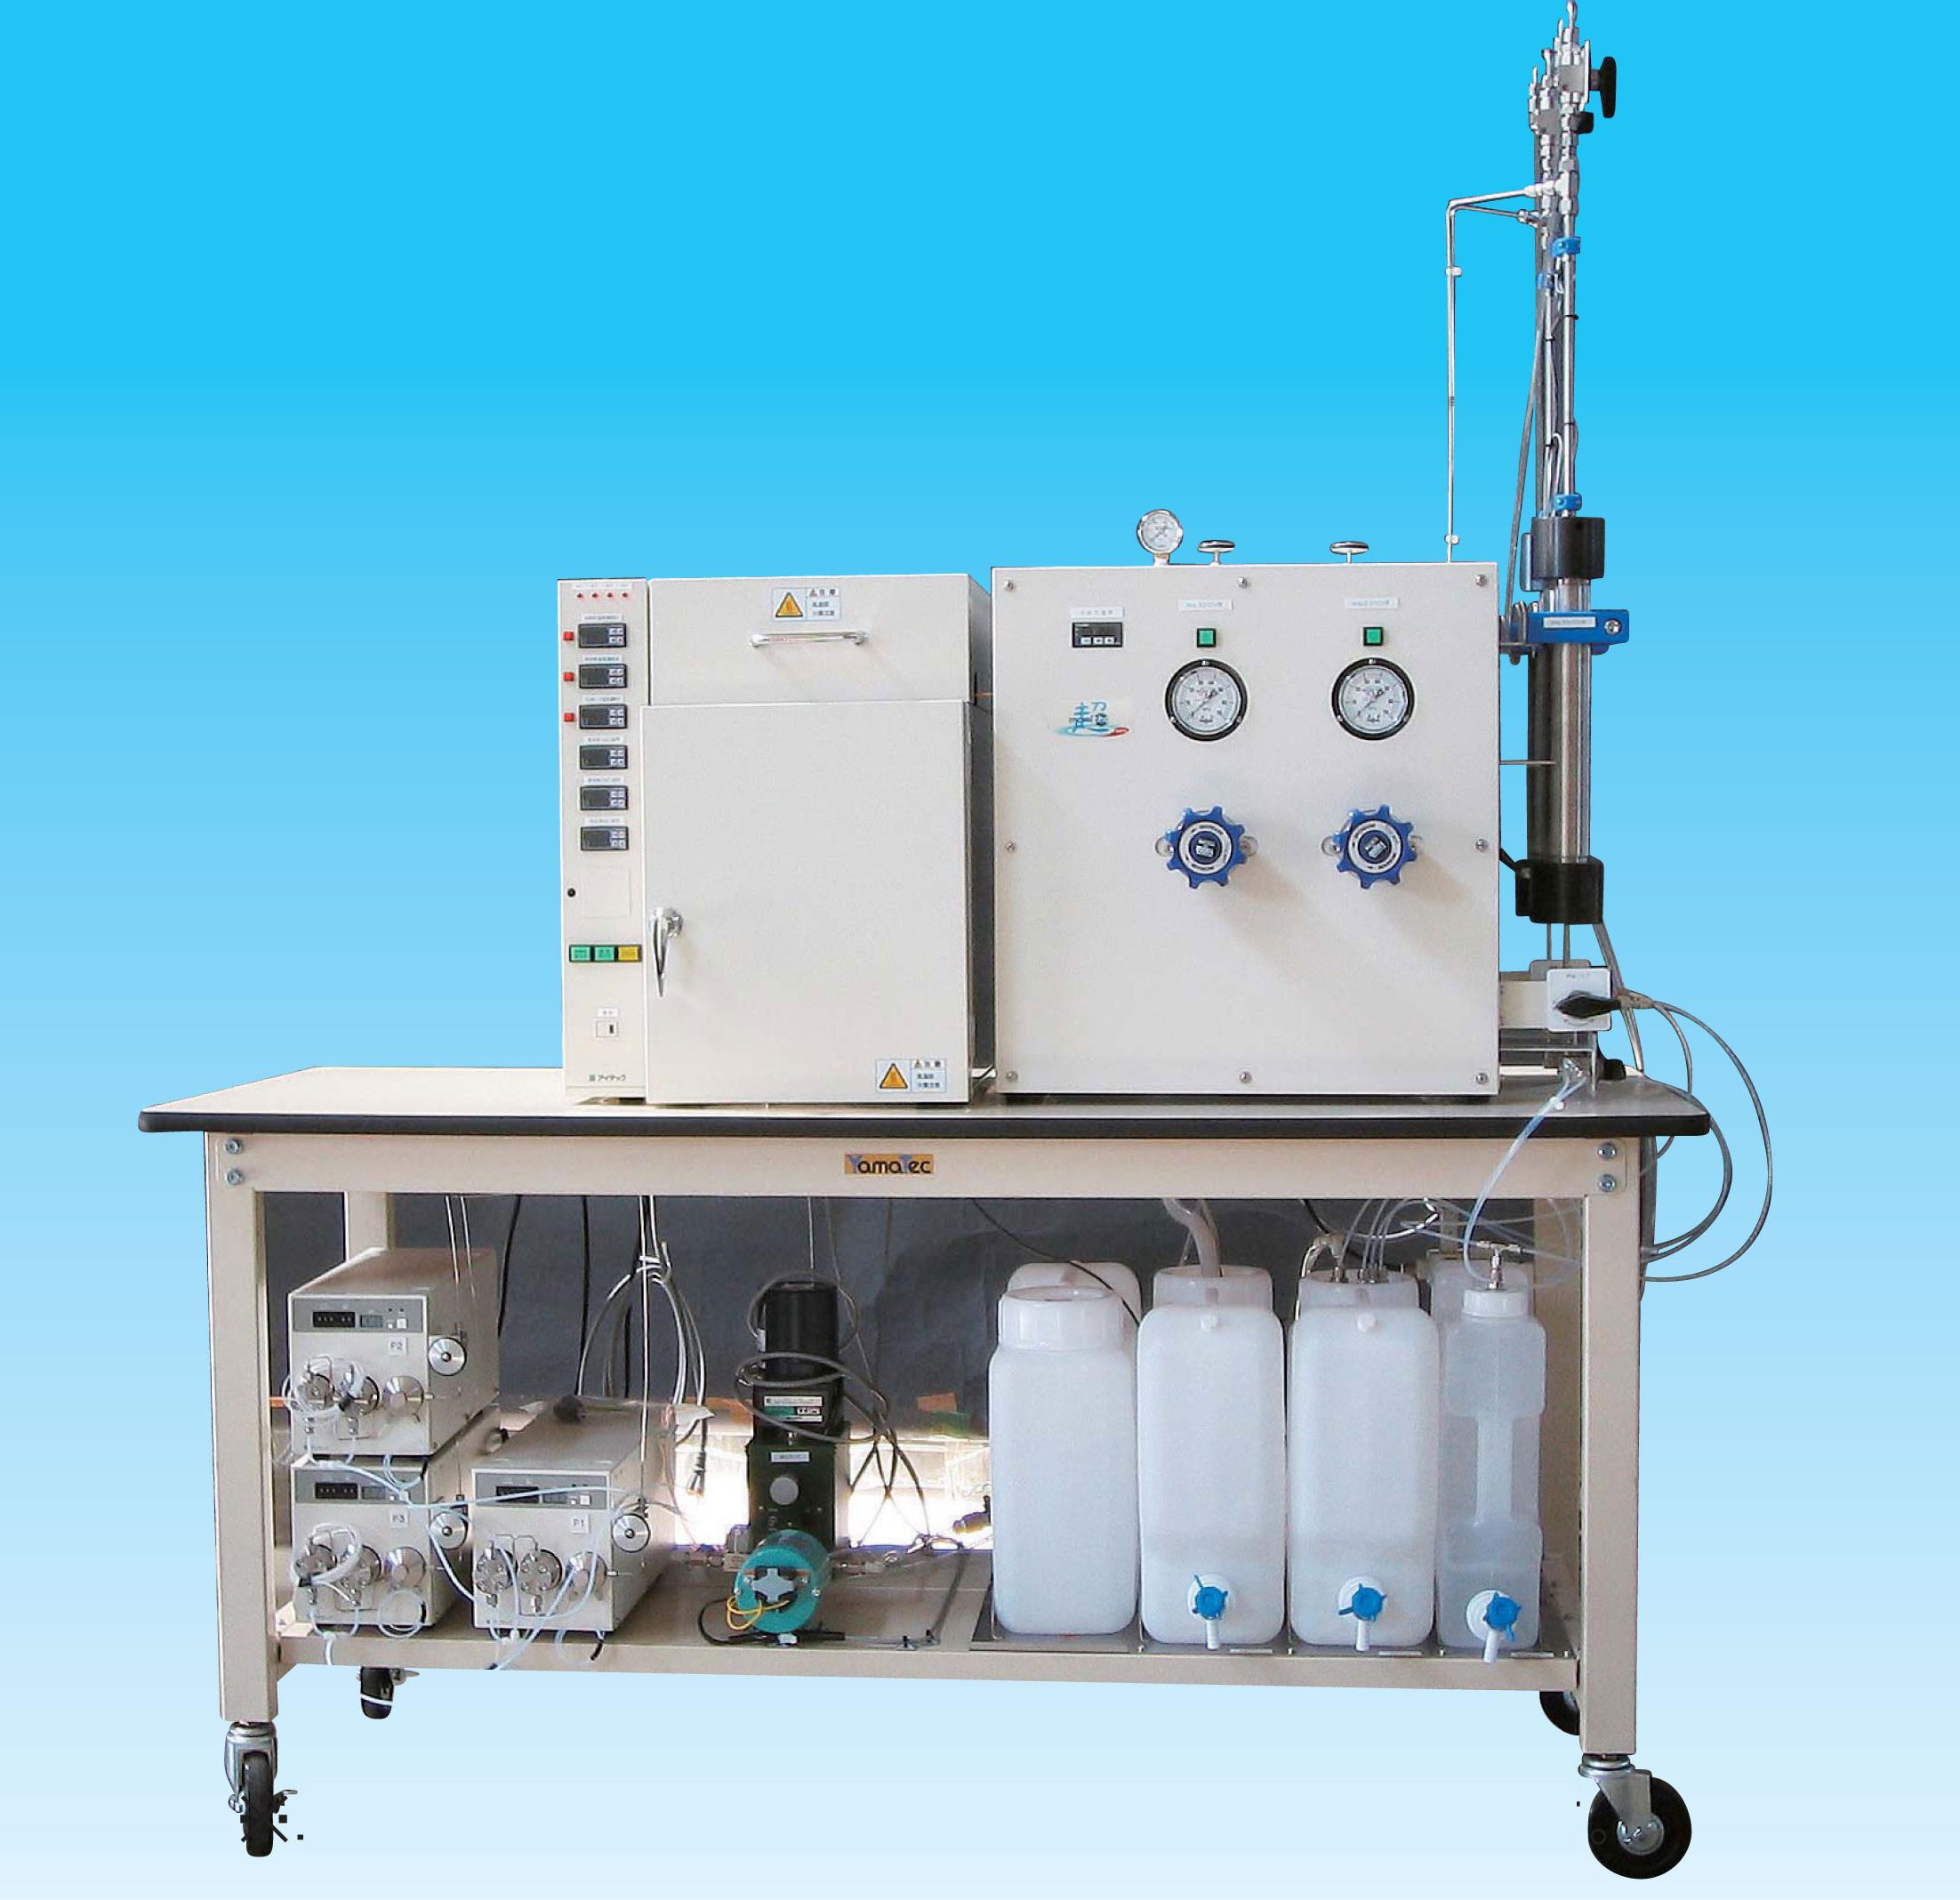 超臨界水ナノ粒子合成試験機 「MOMI超mini」